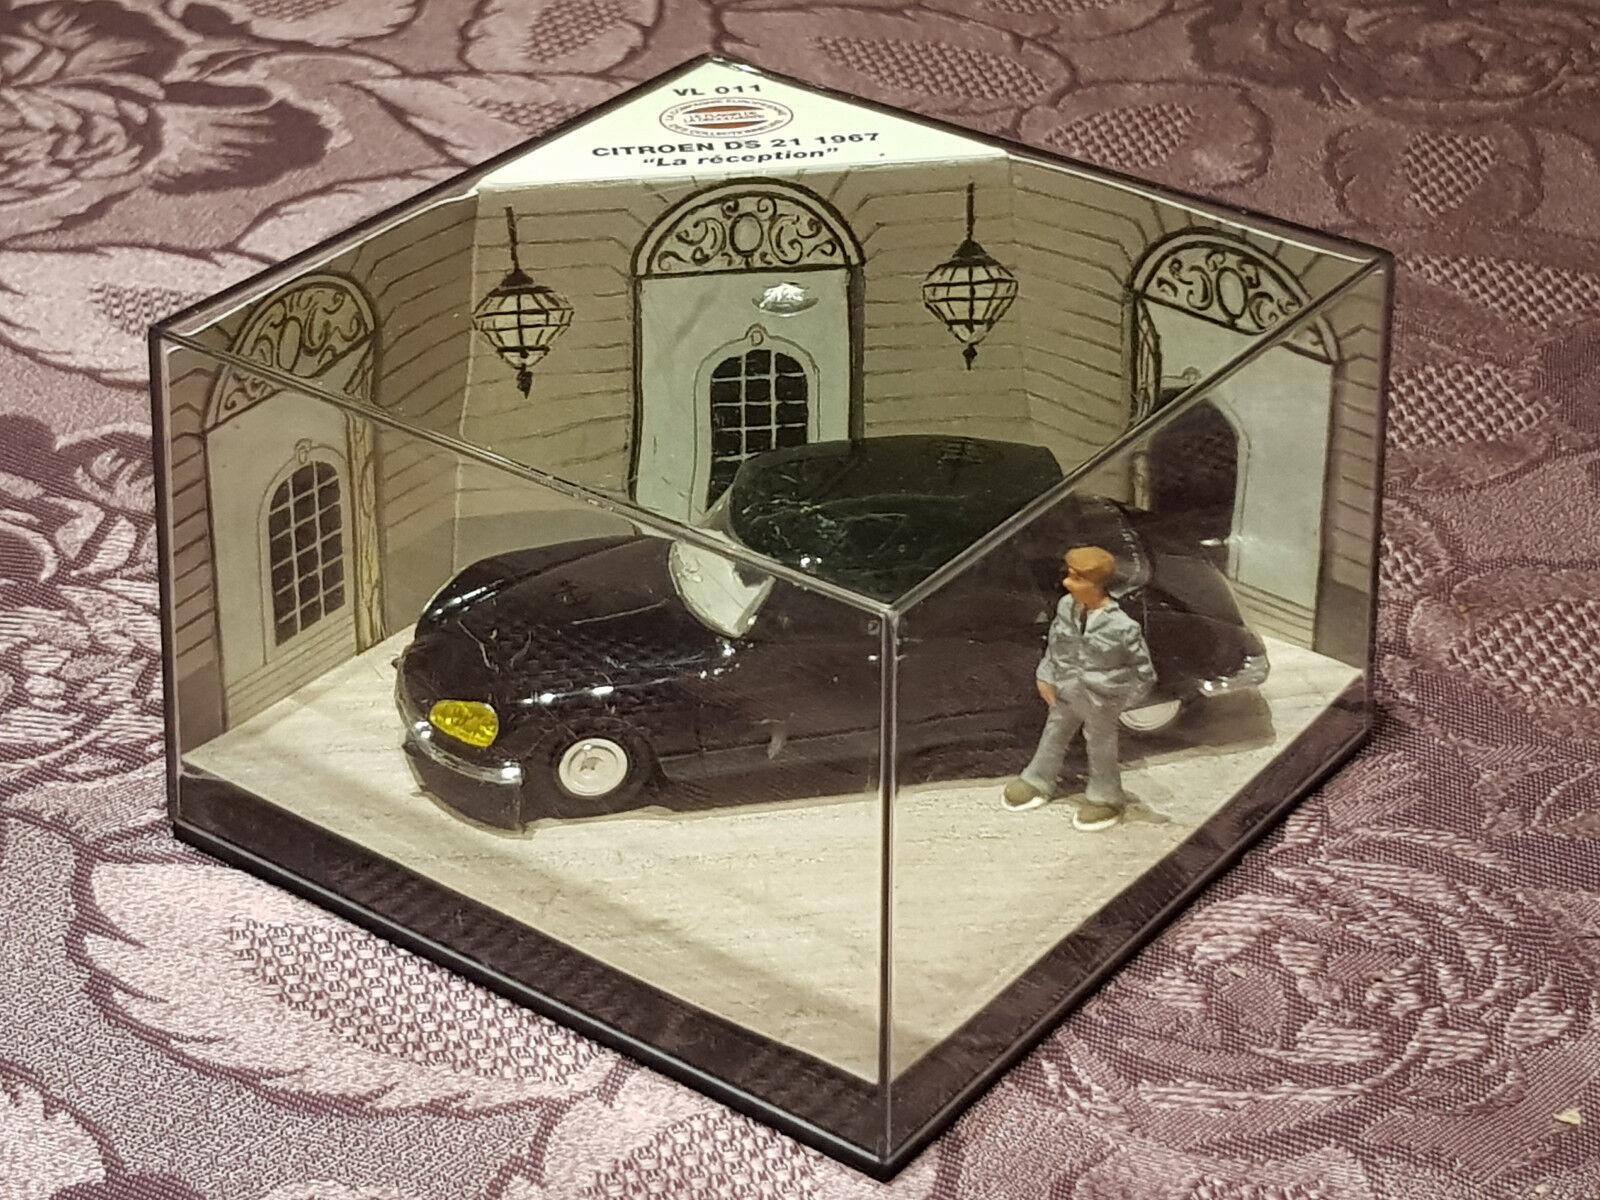 11 Citroen DS 21 1967 Réception Verem Compagnie Europeenne Diorama Diorama Diorama Scéne Plaisir a352a2